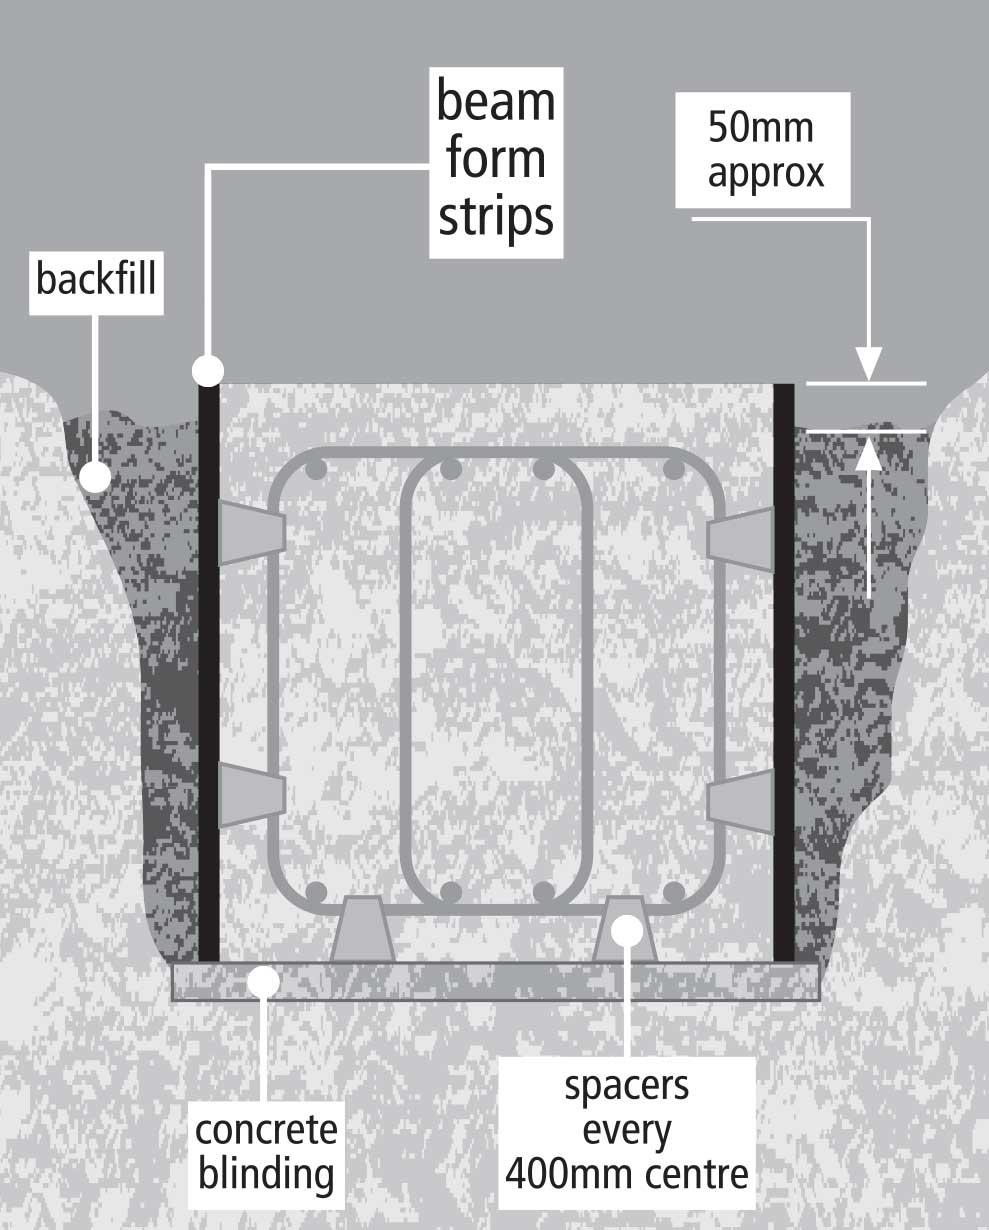 beam-form-strips-formwork-1